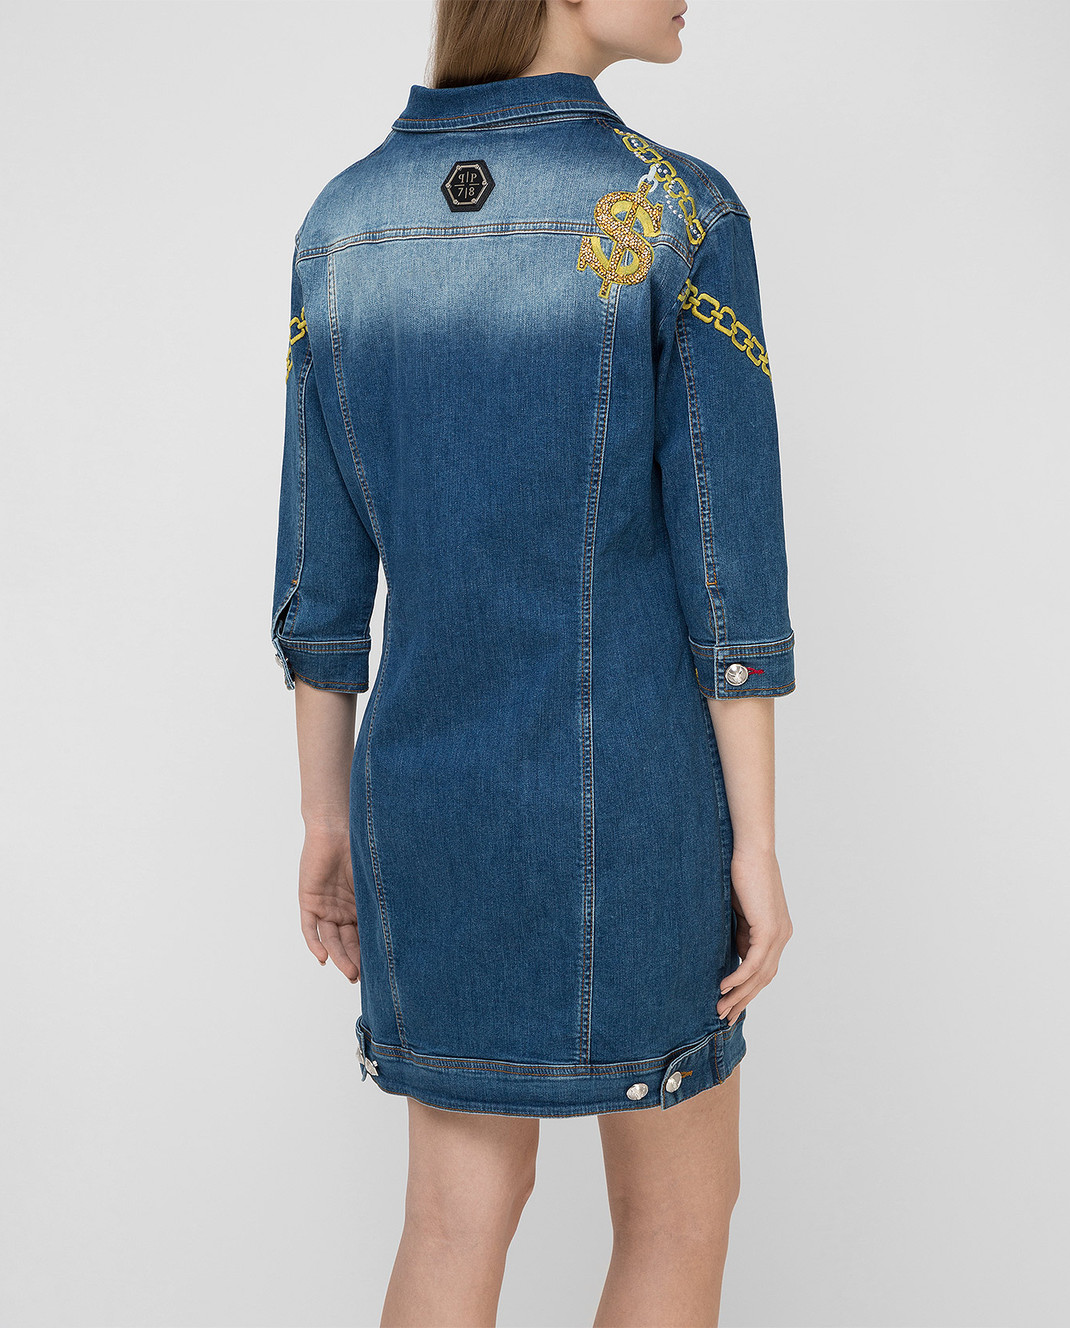 Philipp Plein Синее платье CWDG0016 изображение 4